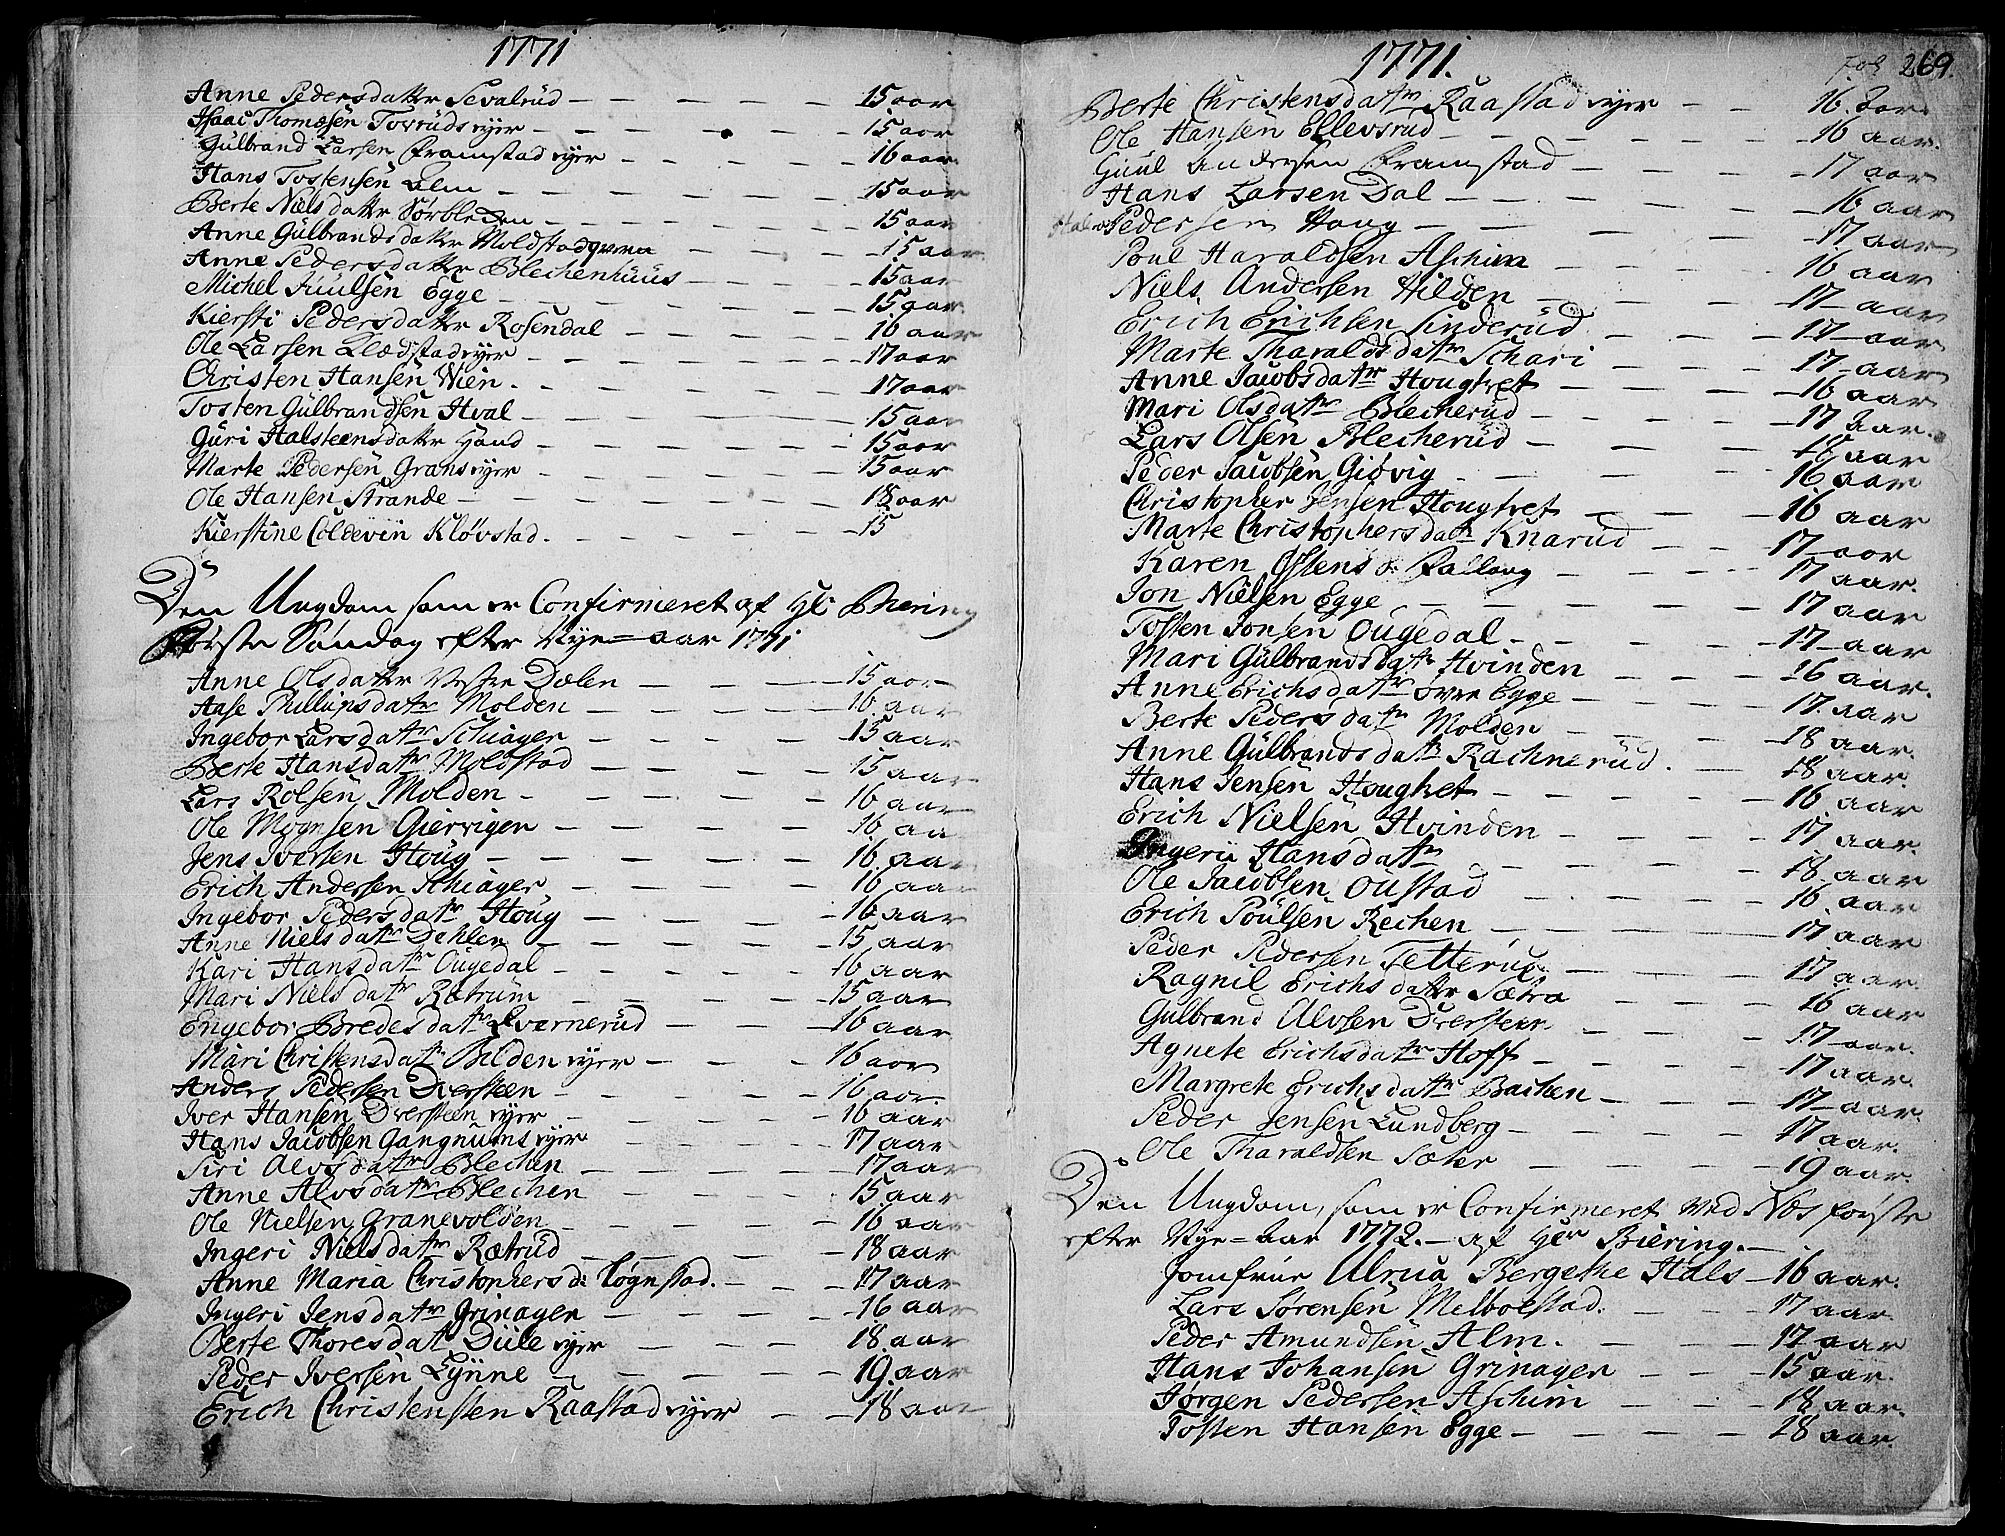 SAH, Gran prestekontor, Ministerialbok nr. 4, 1759-1775, s. 269